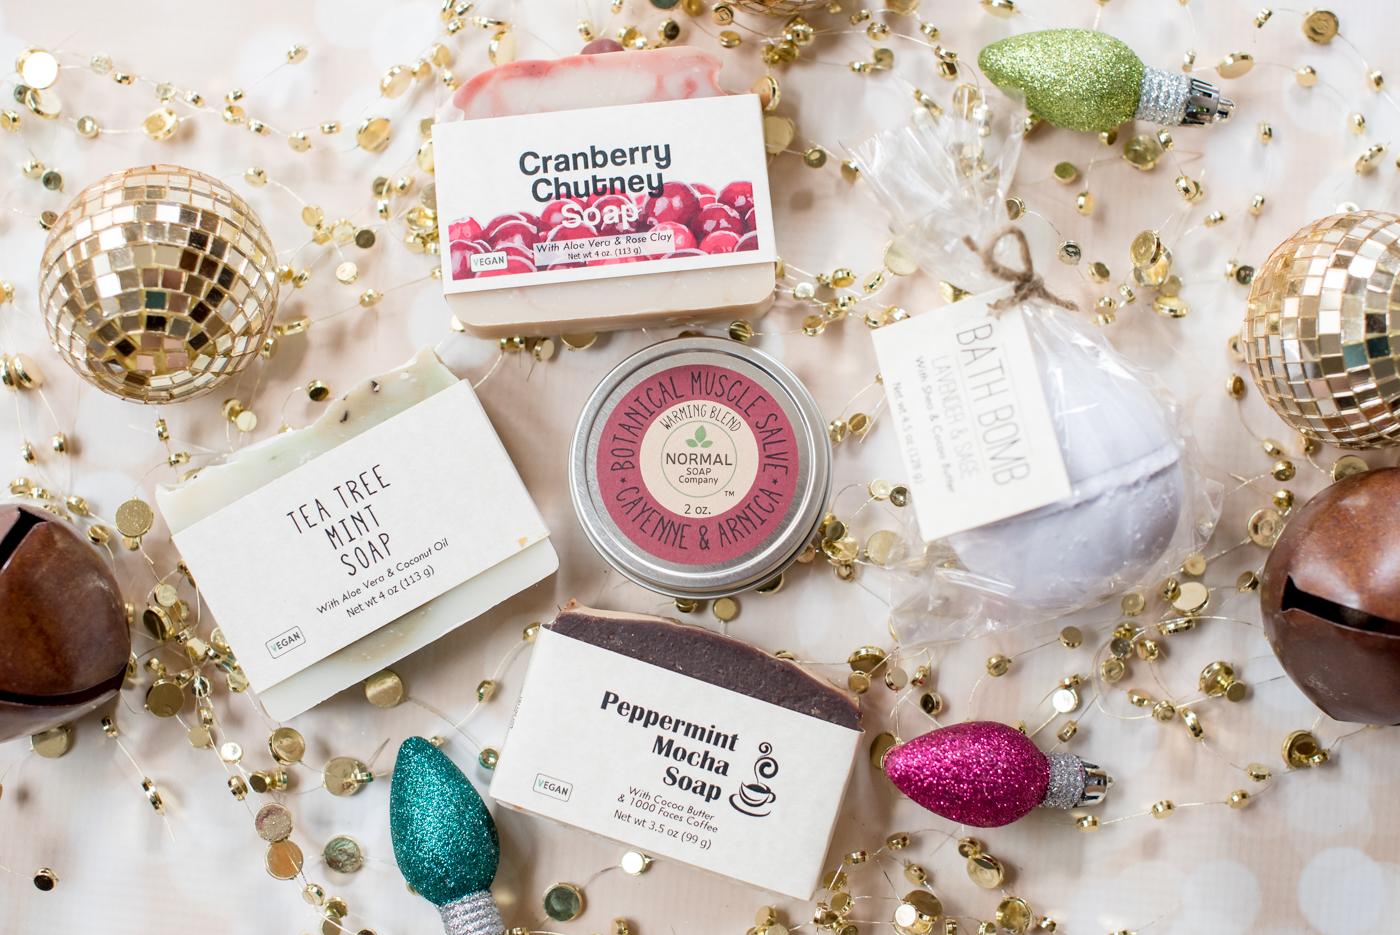 Normal Soap Company | Shop Local Holiday Gift Guide | Athens, GA | @missmollymoon